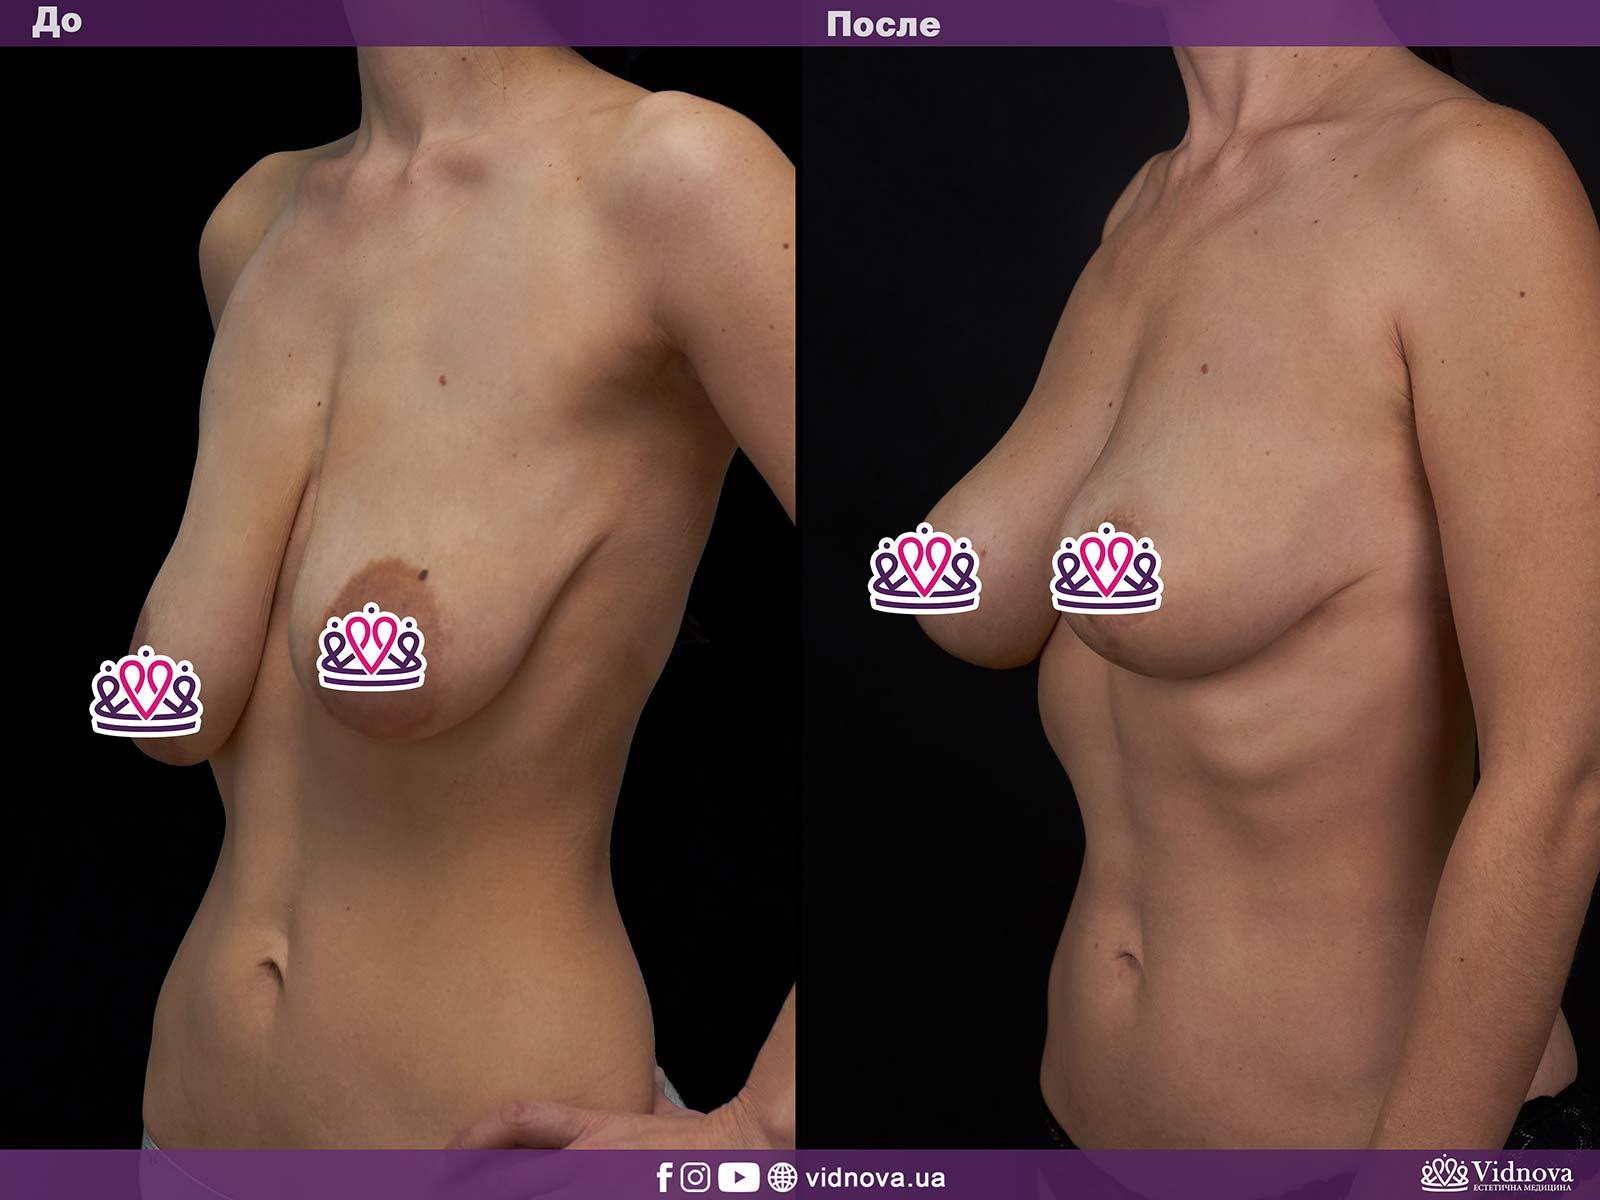 Подтяжка груди: Фото ДО и ПОСЛЕ - Пример №8-2 - Клиника Vidnova